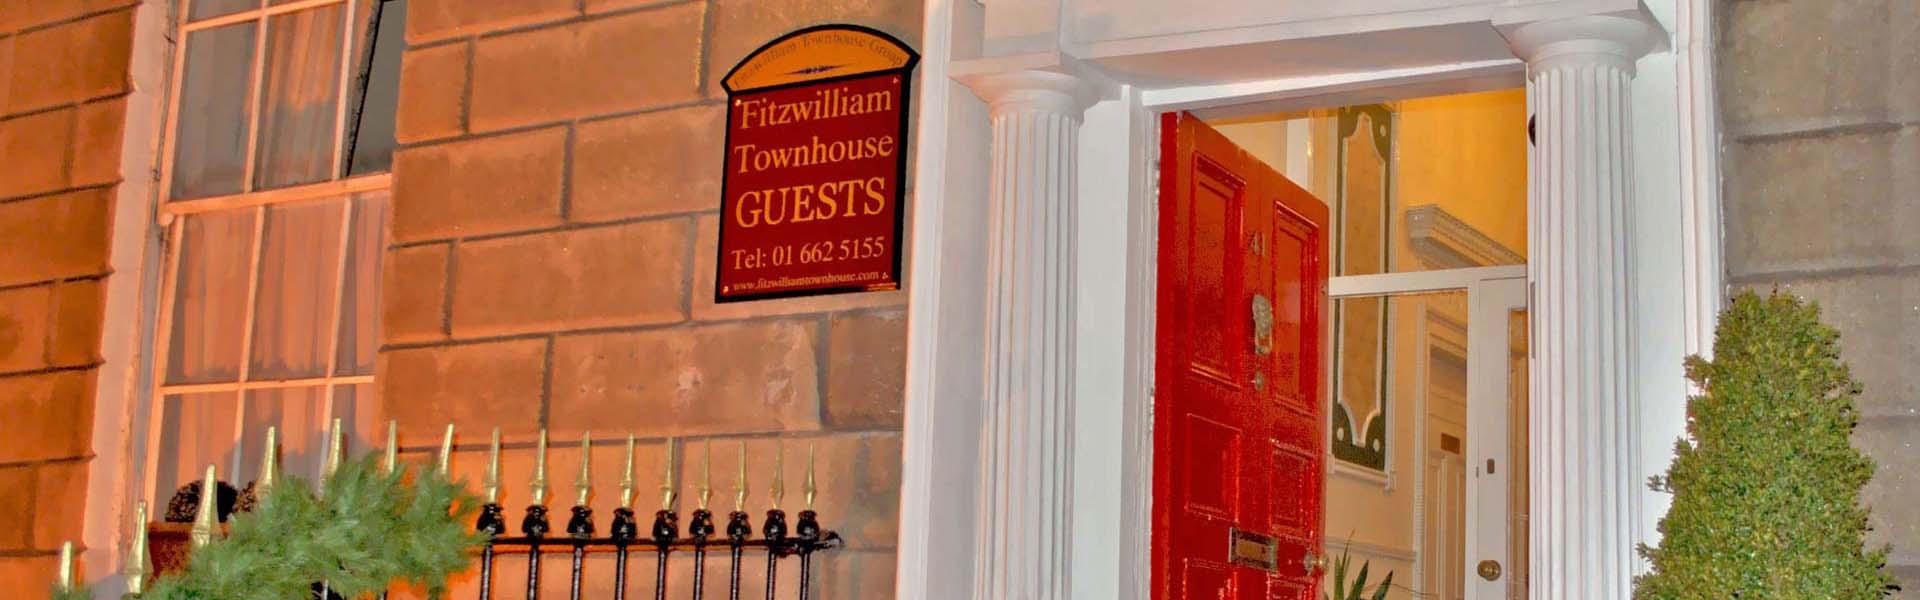 Fitzwilliam Townhouse B&B in Dublin City Centre | 3 Star